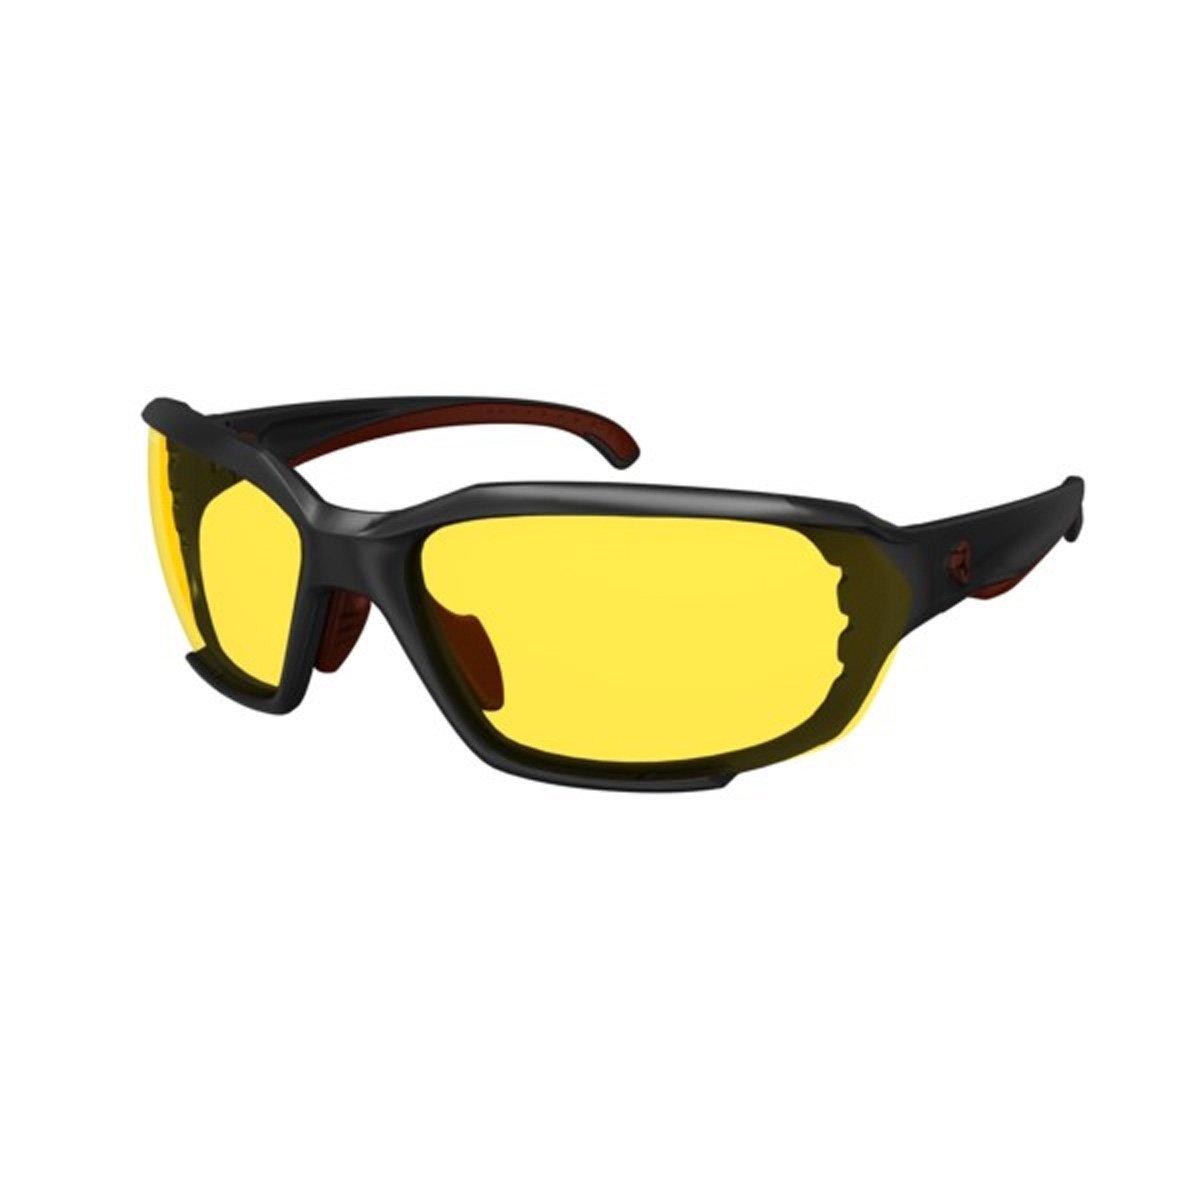 Ryders Eyewear Rockworkサングラス B06ZYBH8XB BLACK / YELLOW LENS 74%-25%|イエロー BLACK / YELLOW LENS 74%-25%